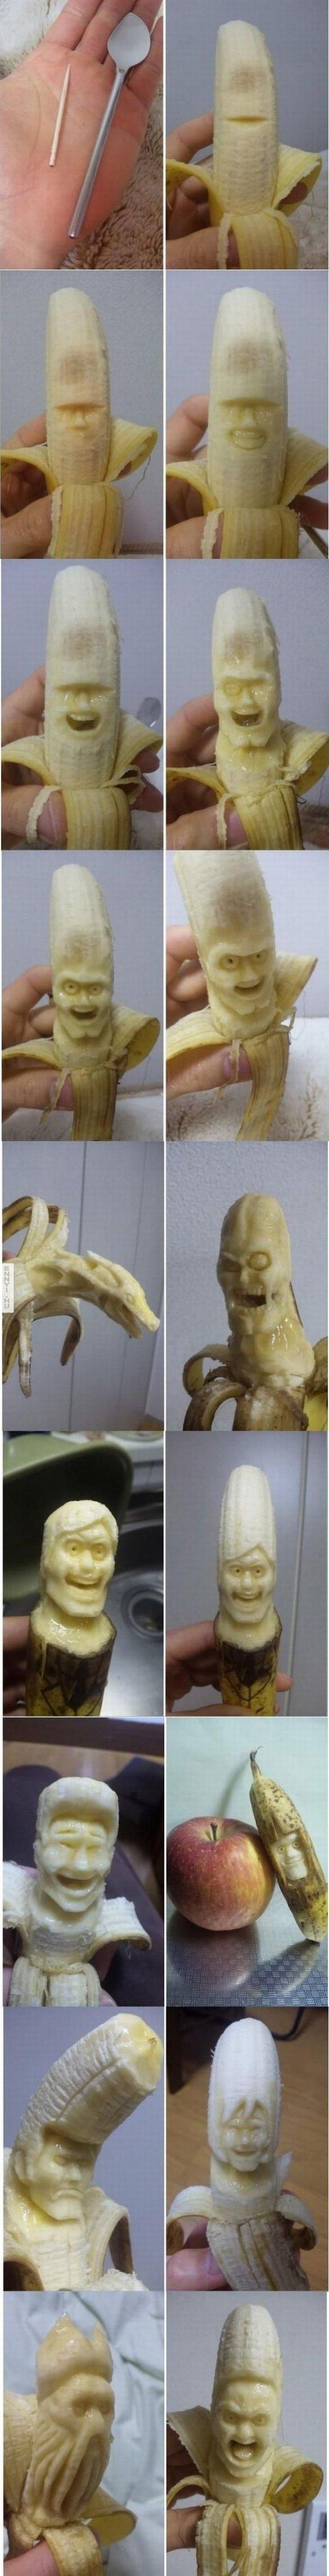 bananalkotasok